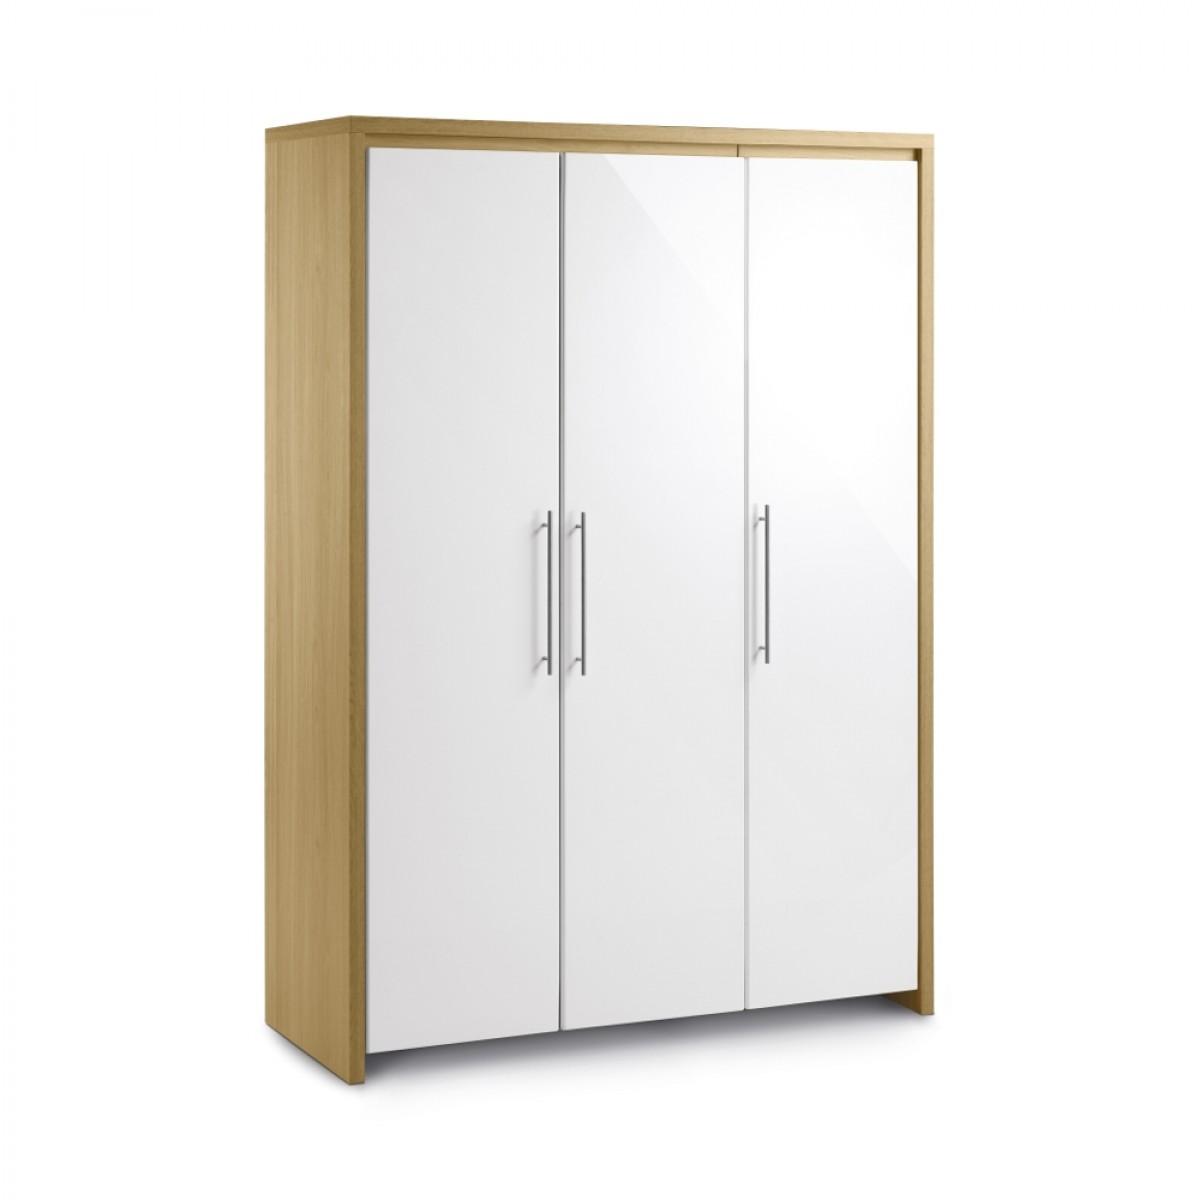 Stockholm Gloss White and Light Oak 3 Door All Hanging Wardrobe